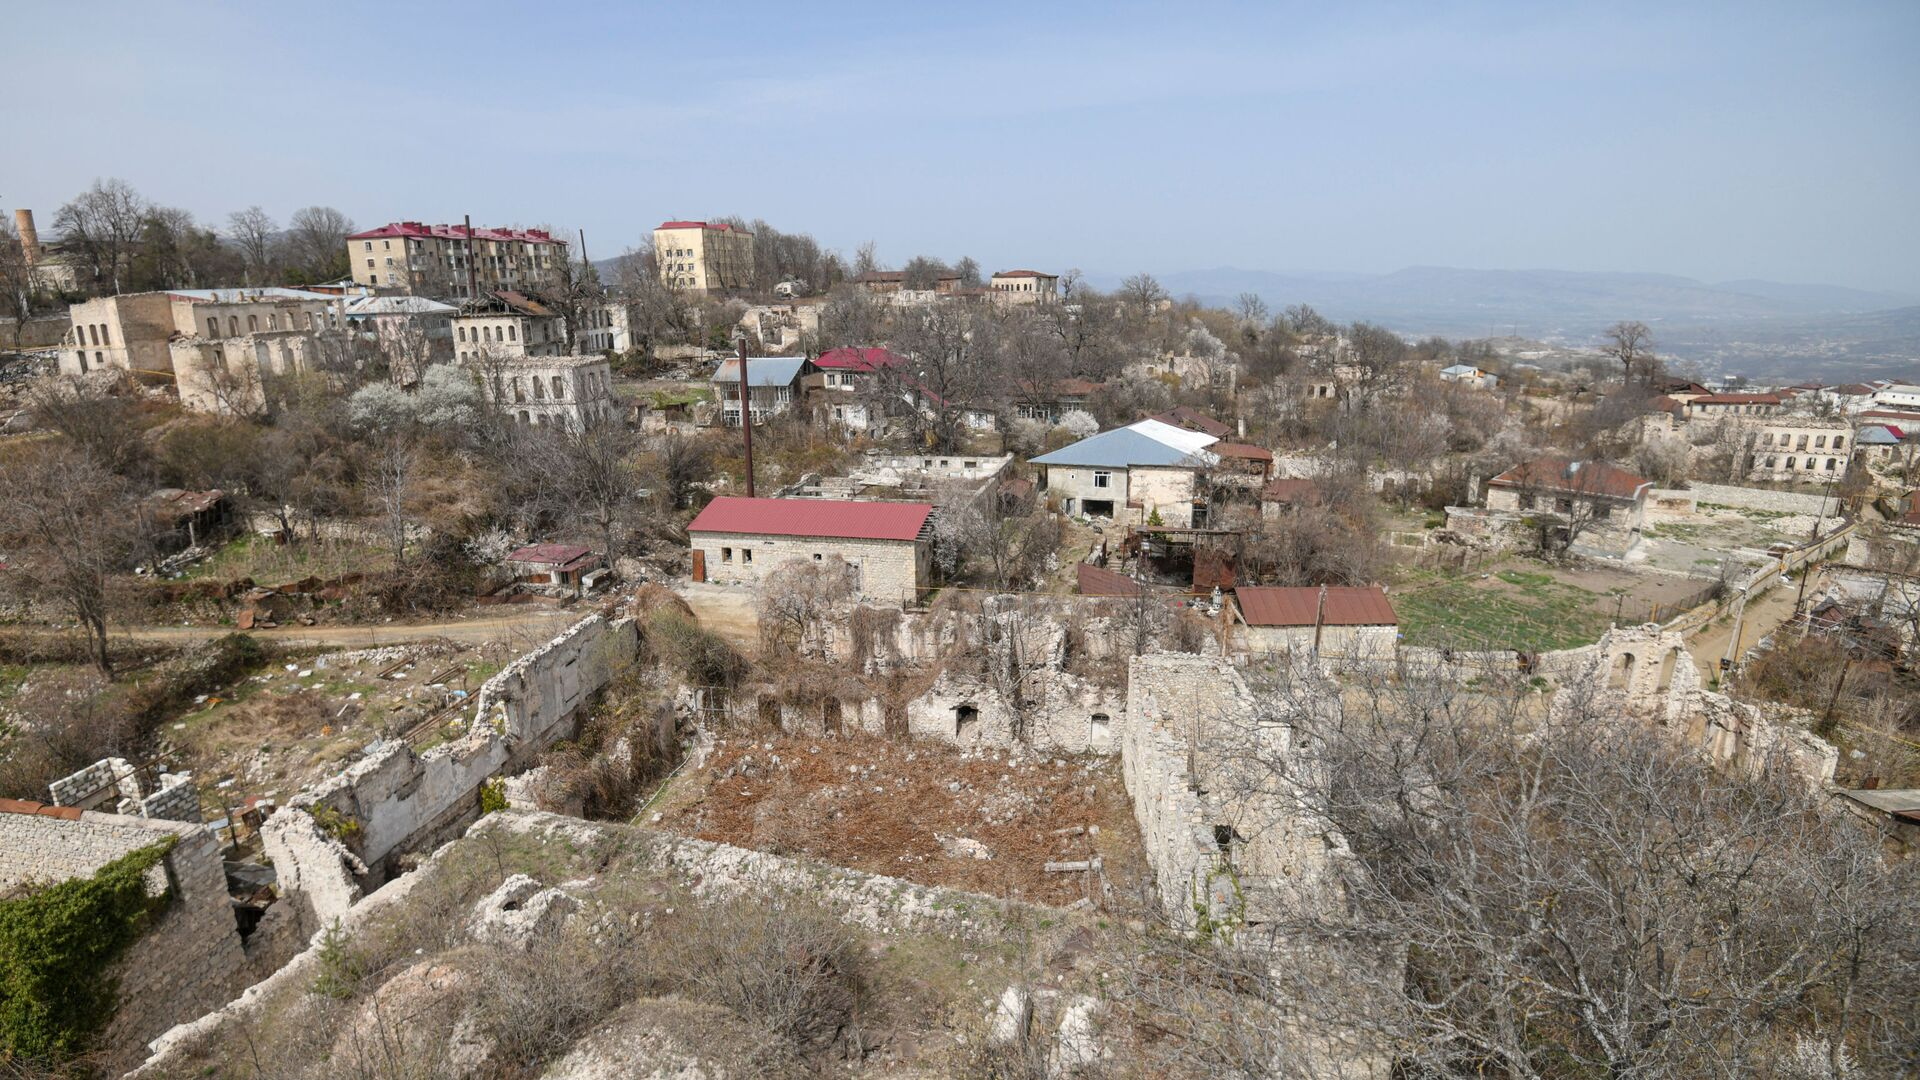 Вид на город Шуша, фото из архива - Sputnik Azərbaycan, 1920, 25.08.2021